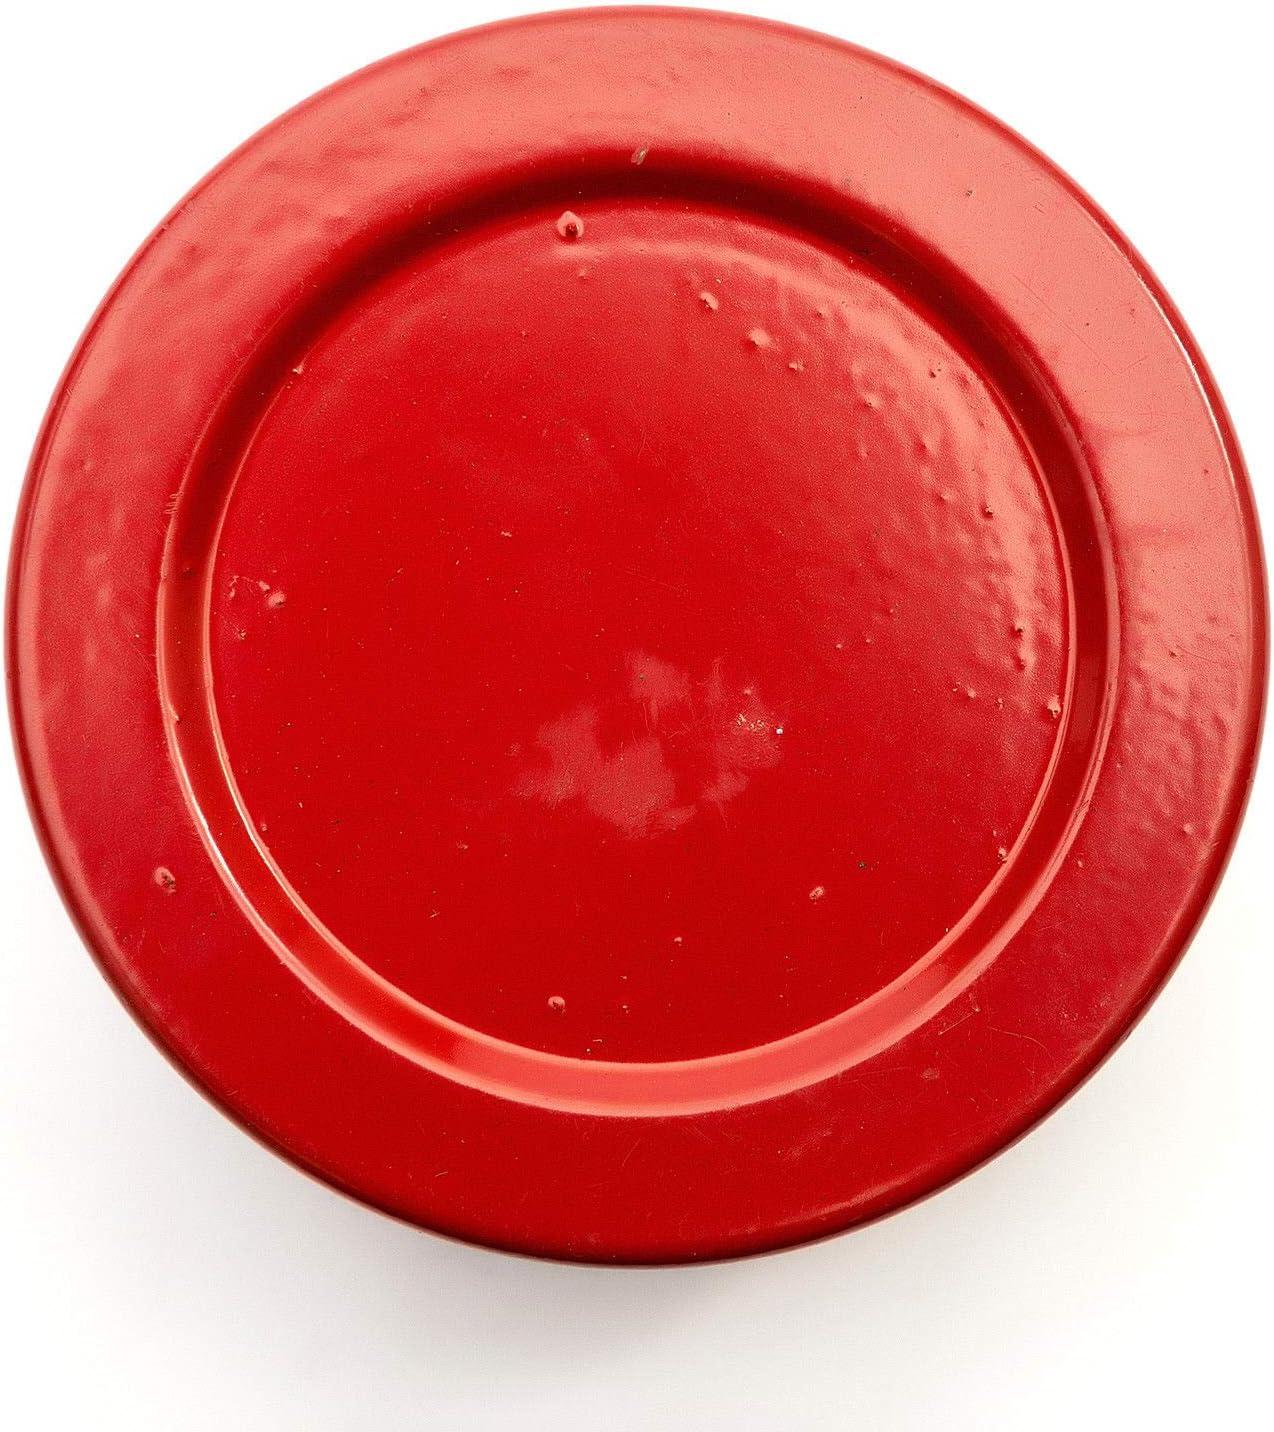 Filtre /à air K /& N 38/mm Pancake cou droite rouge Pit Bike